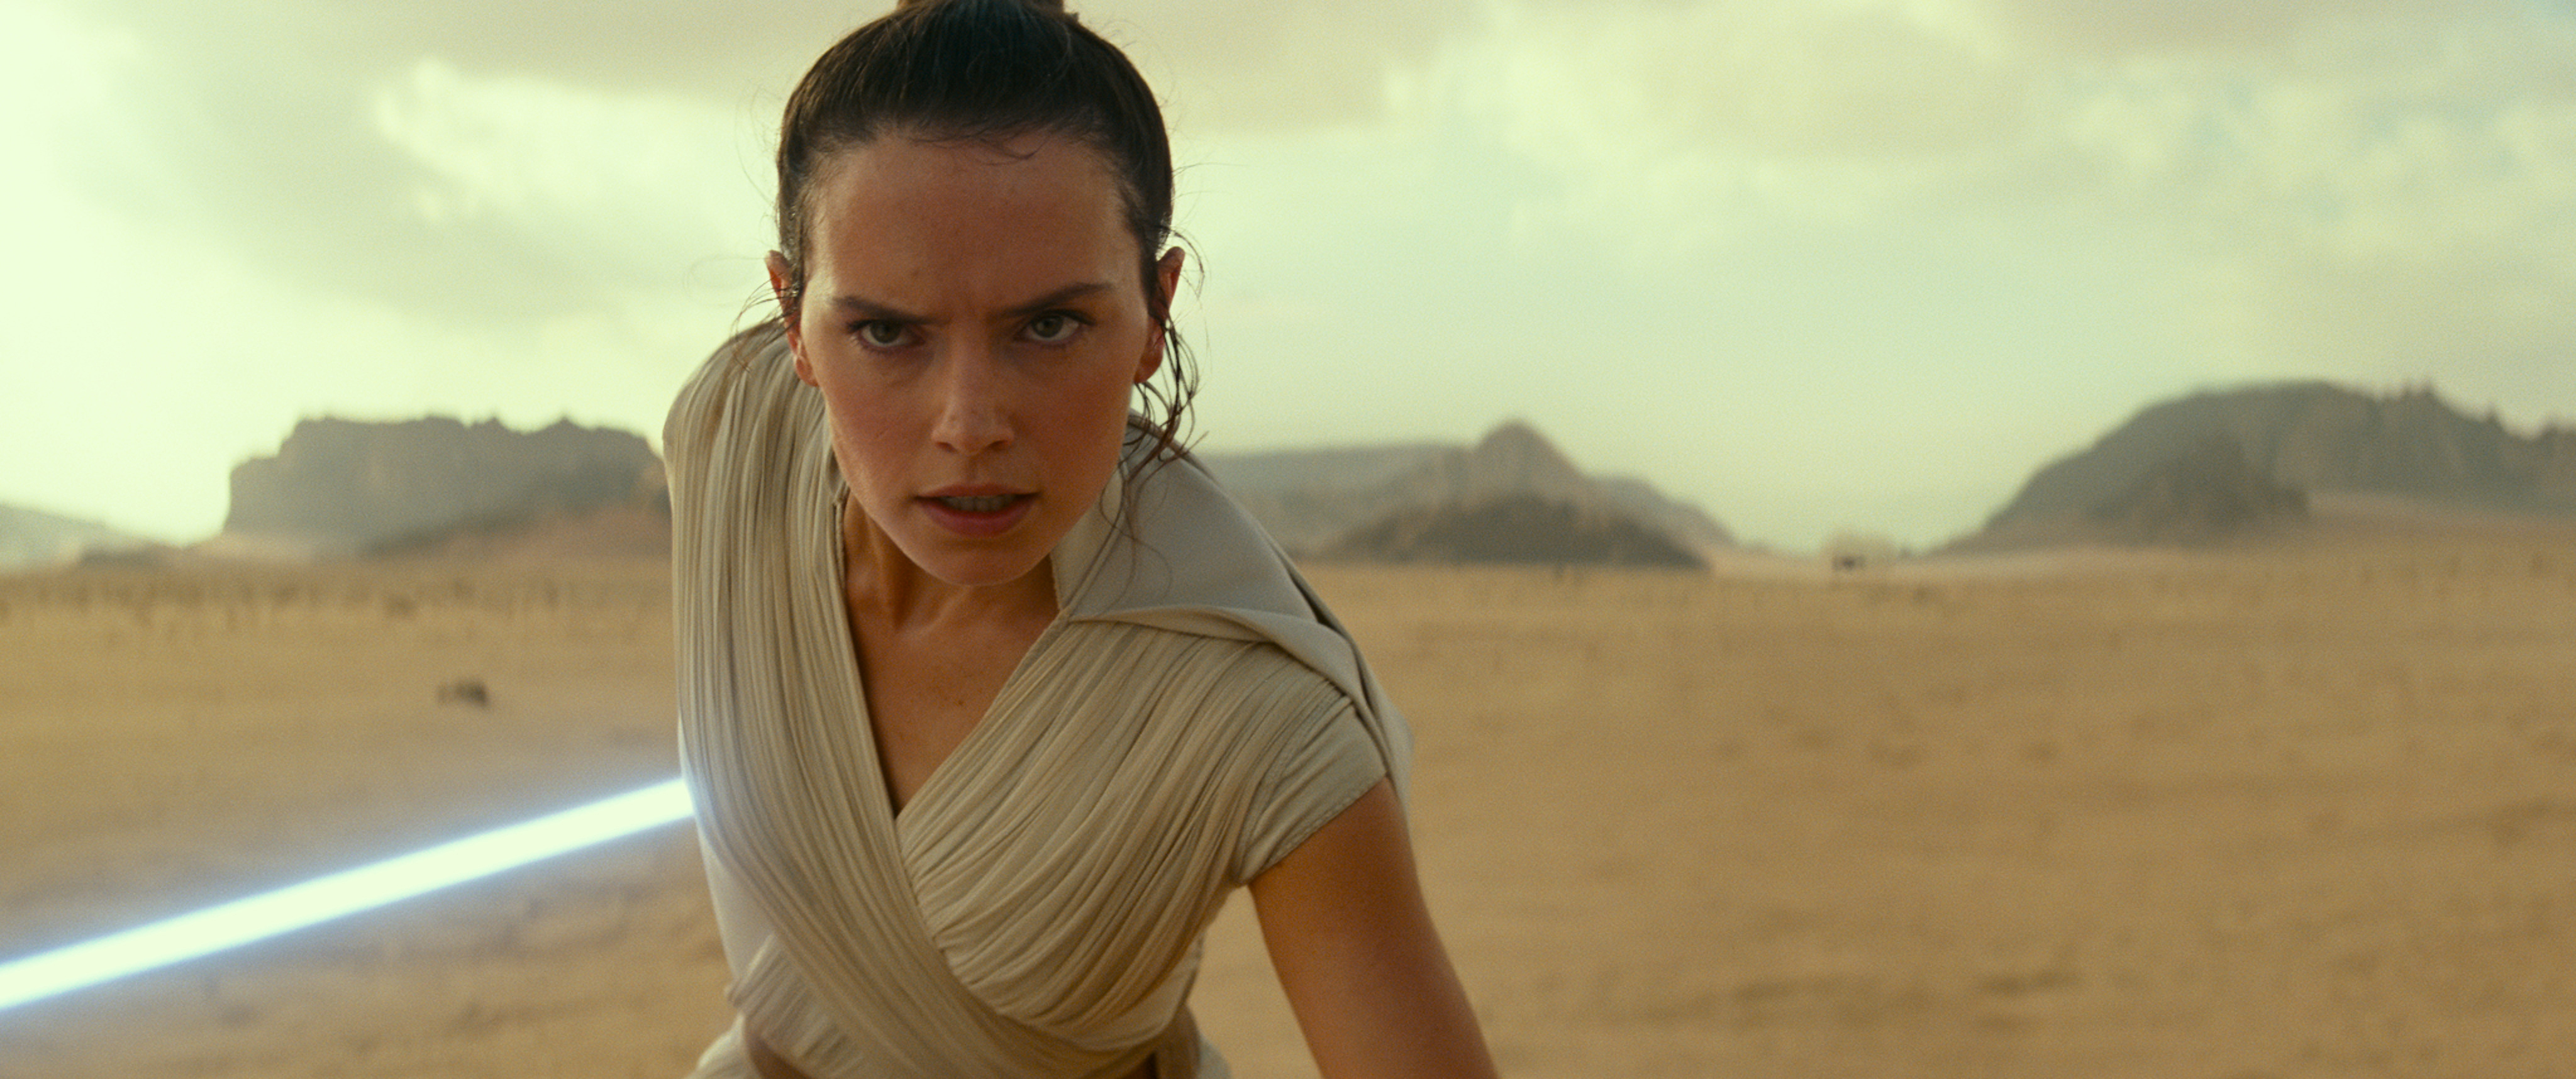 Disney Warner Bros Star Wars DC Films Box Office